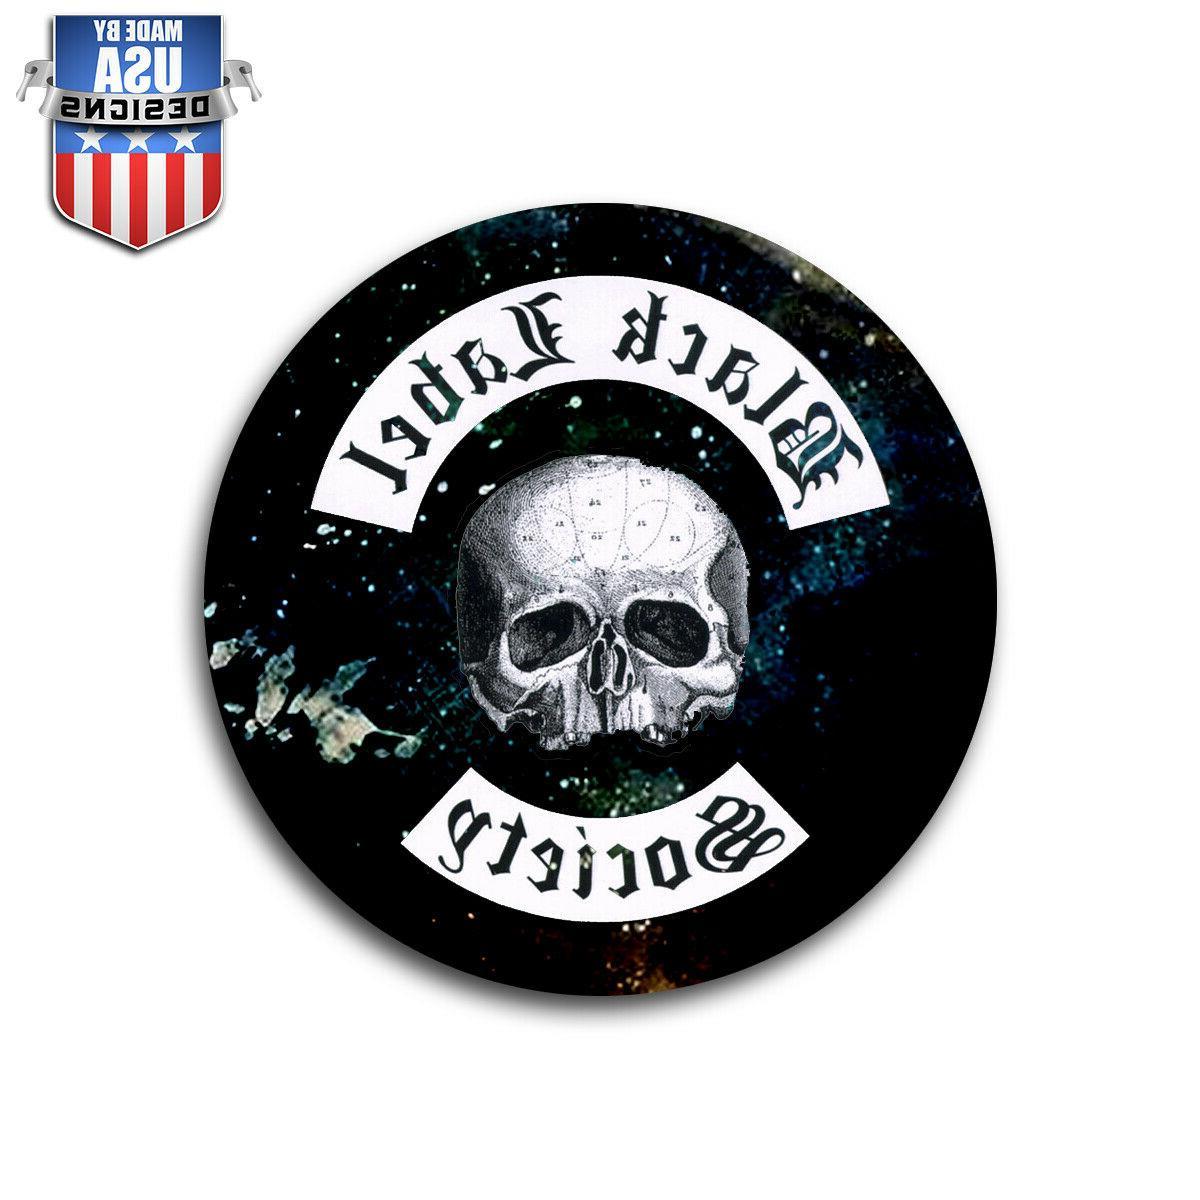 black label society grunge sticker decal phone